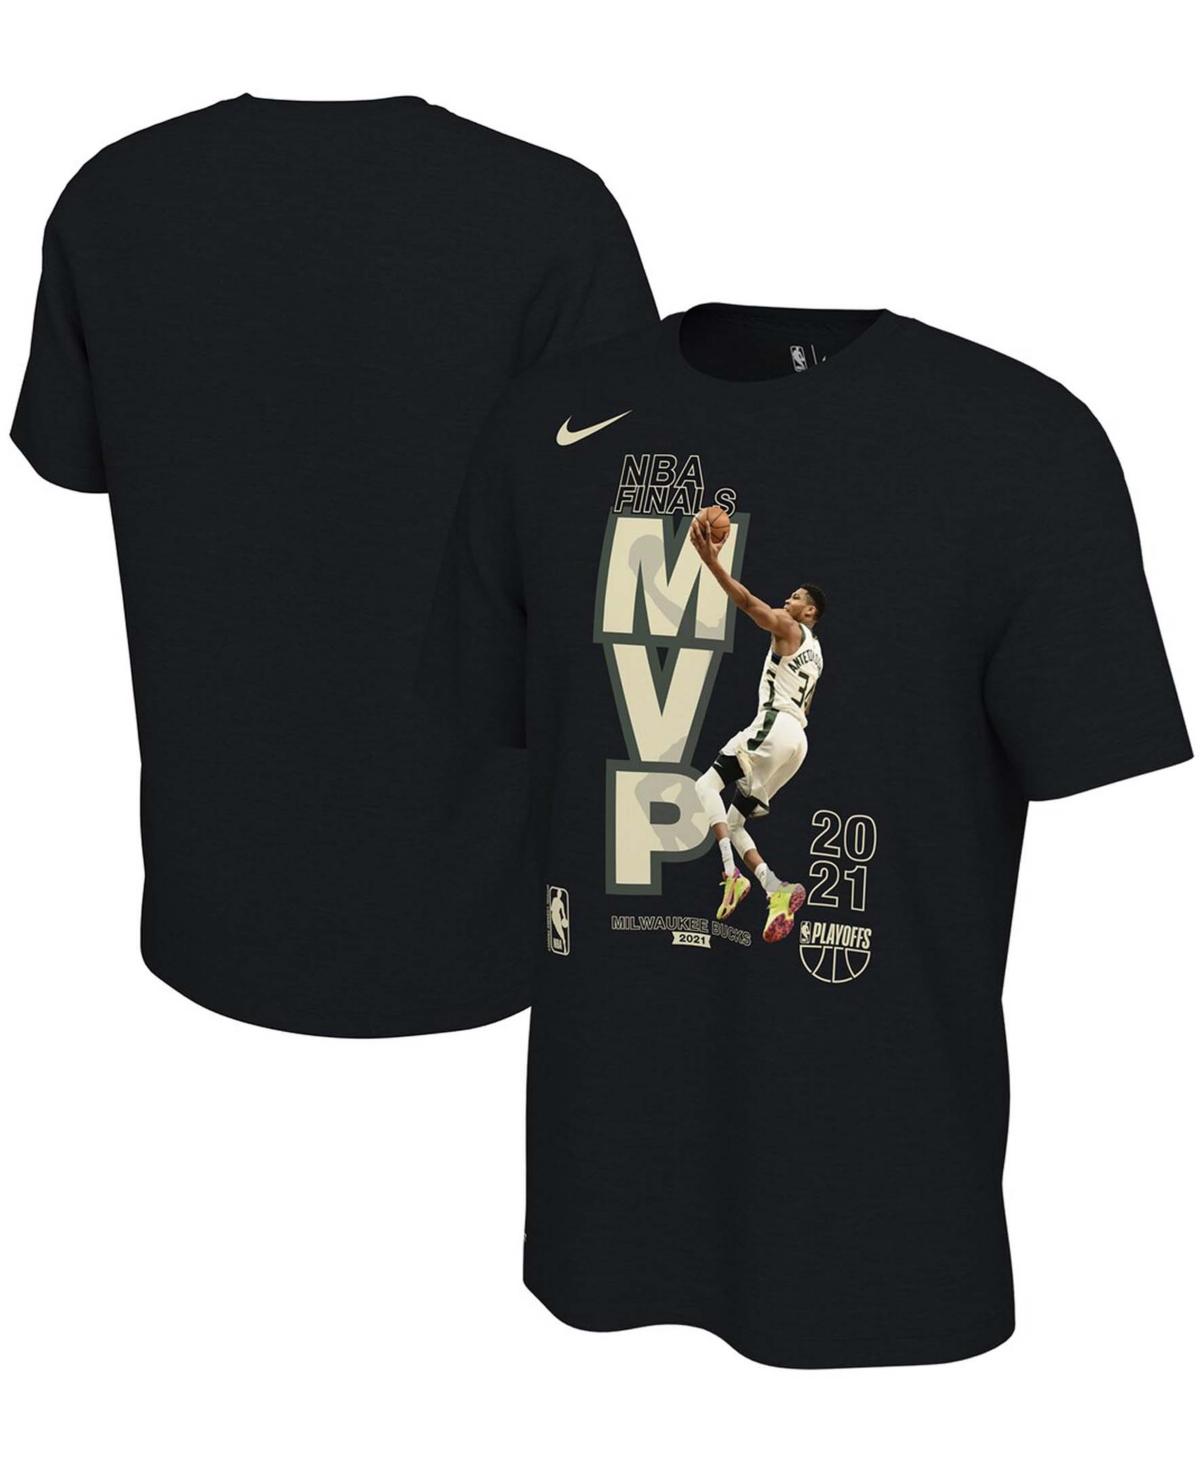 Men's Giannis Antetokounmpo Black Milwaukee Bucks 2021 Nba Finals Champions Mvp T-shirt